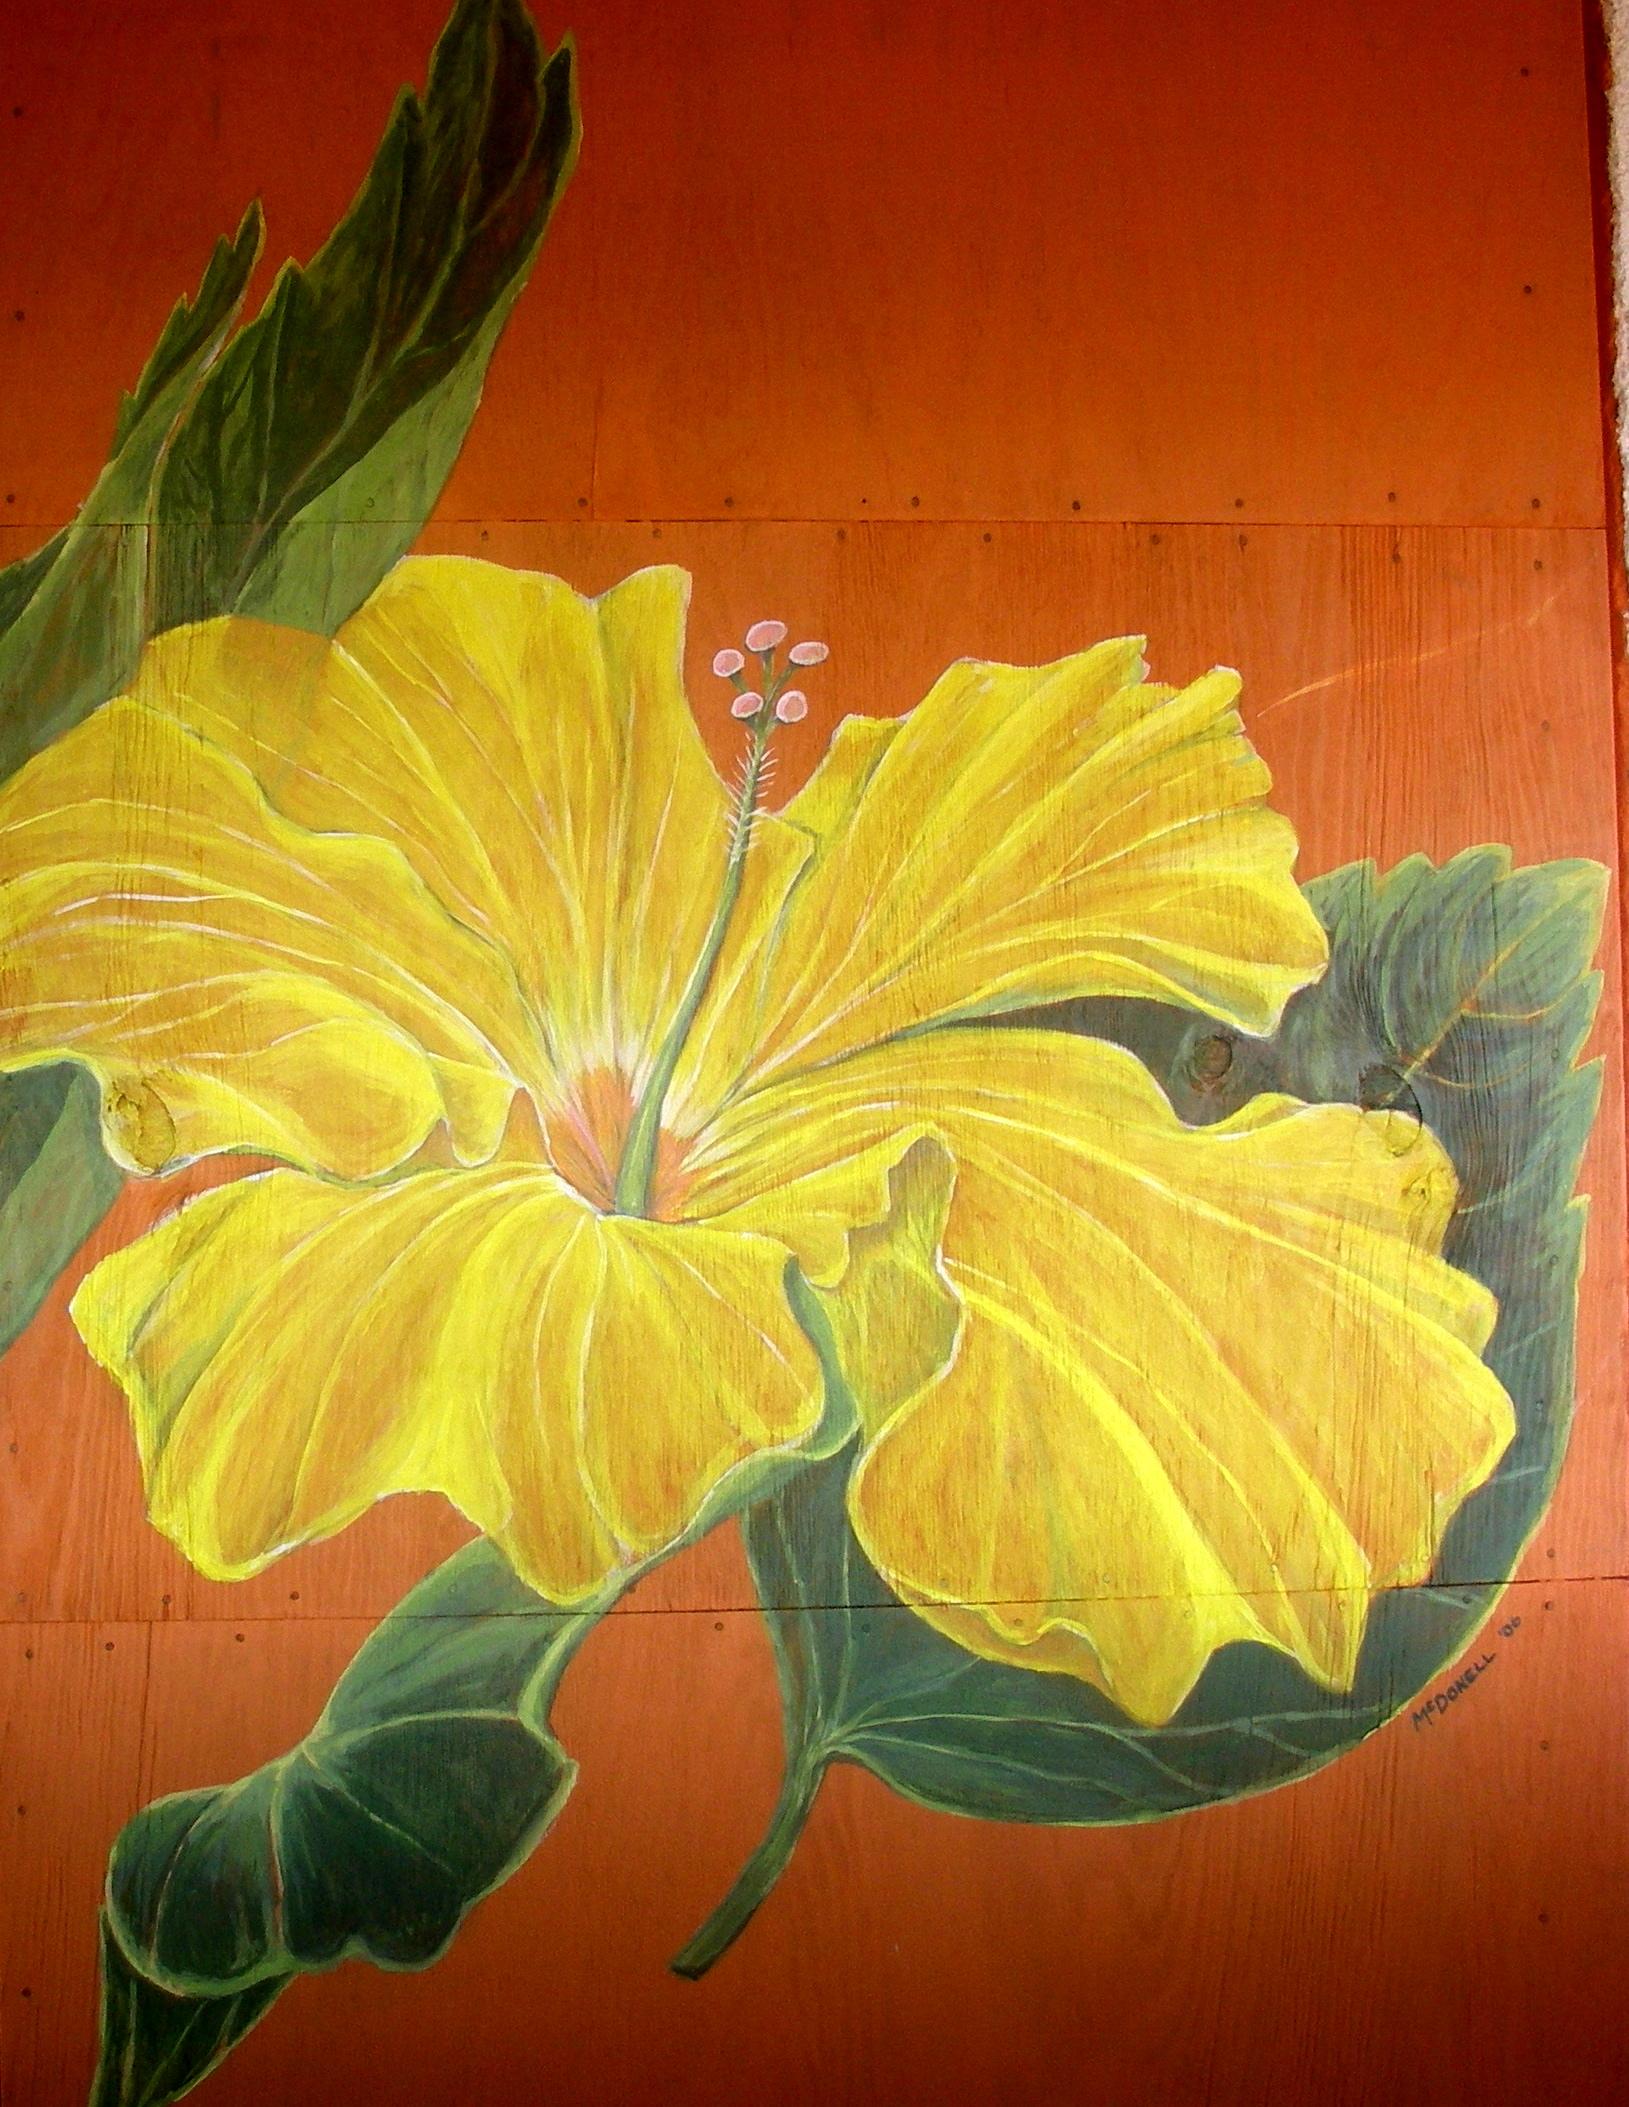 Hibiscus Mural in Troncones